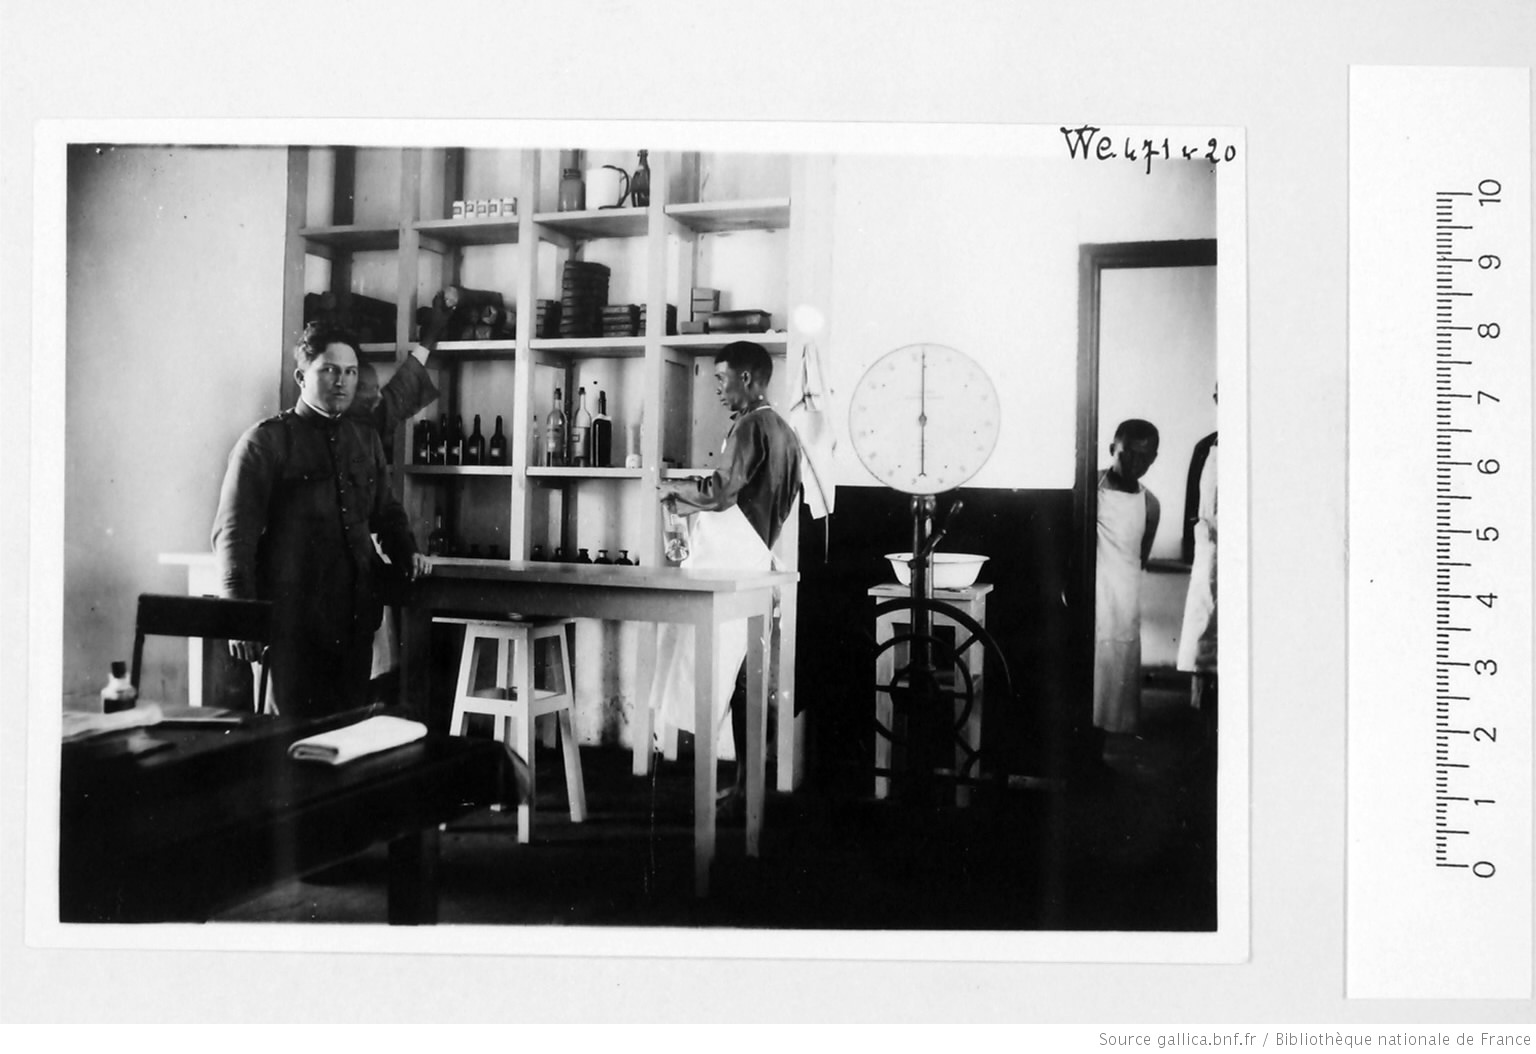 [39 phot. d'A.E.F. en 1924. Enregistré en 1936] - 20